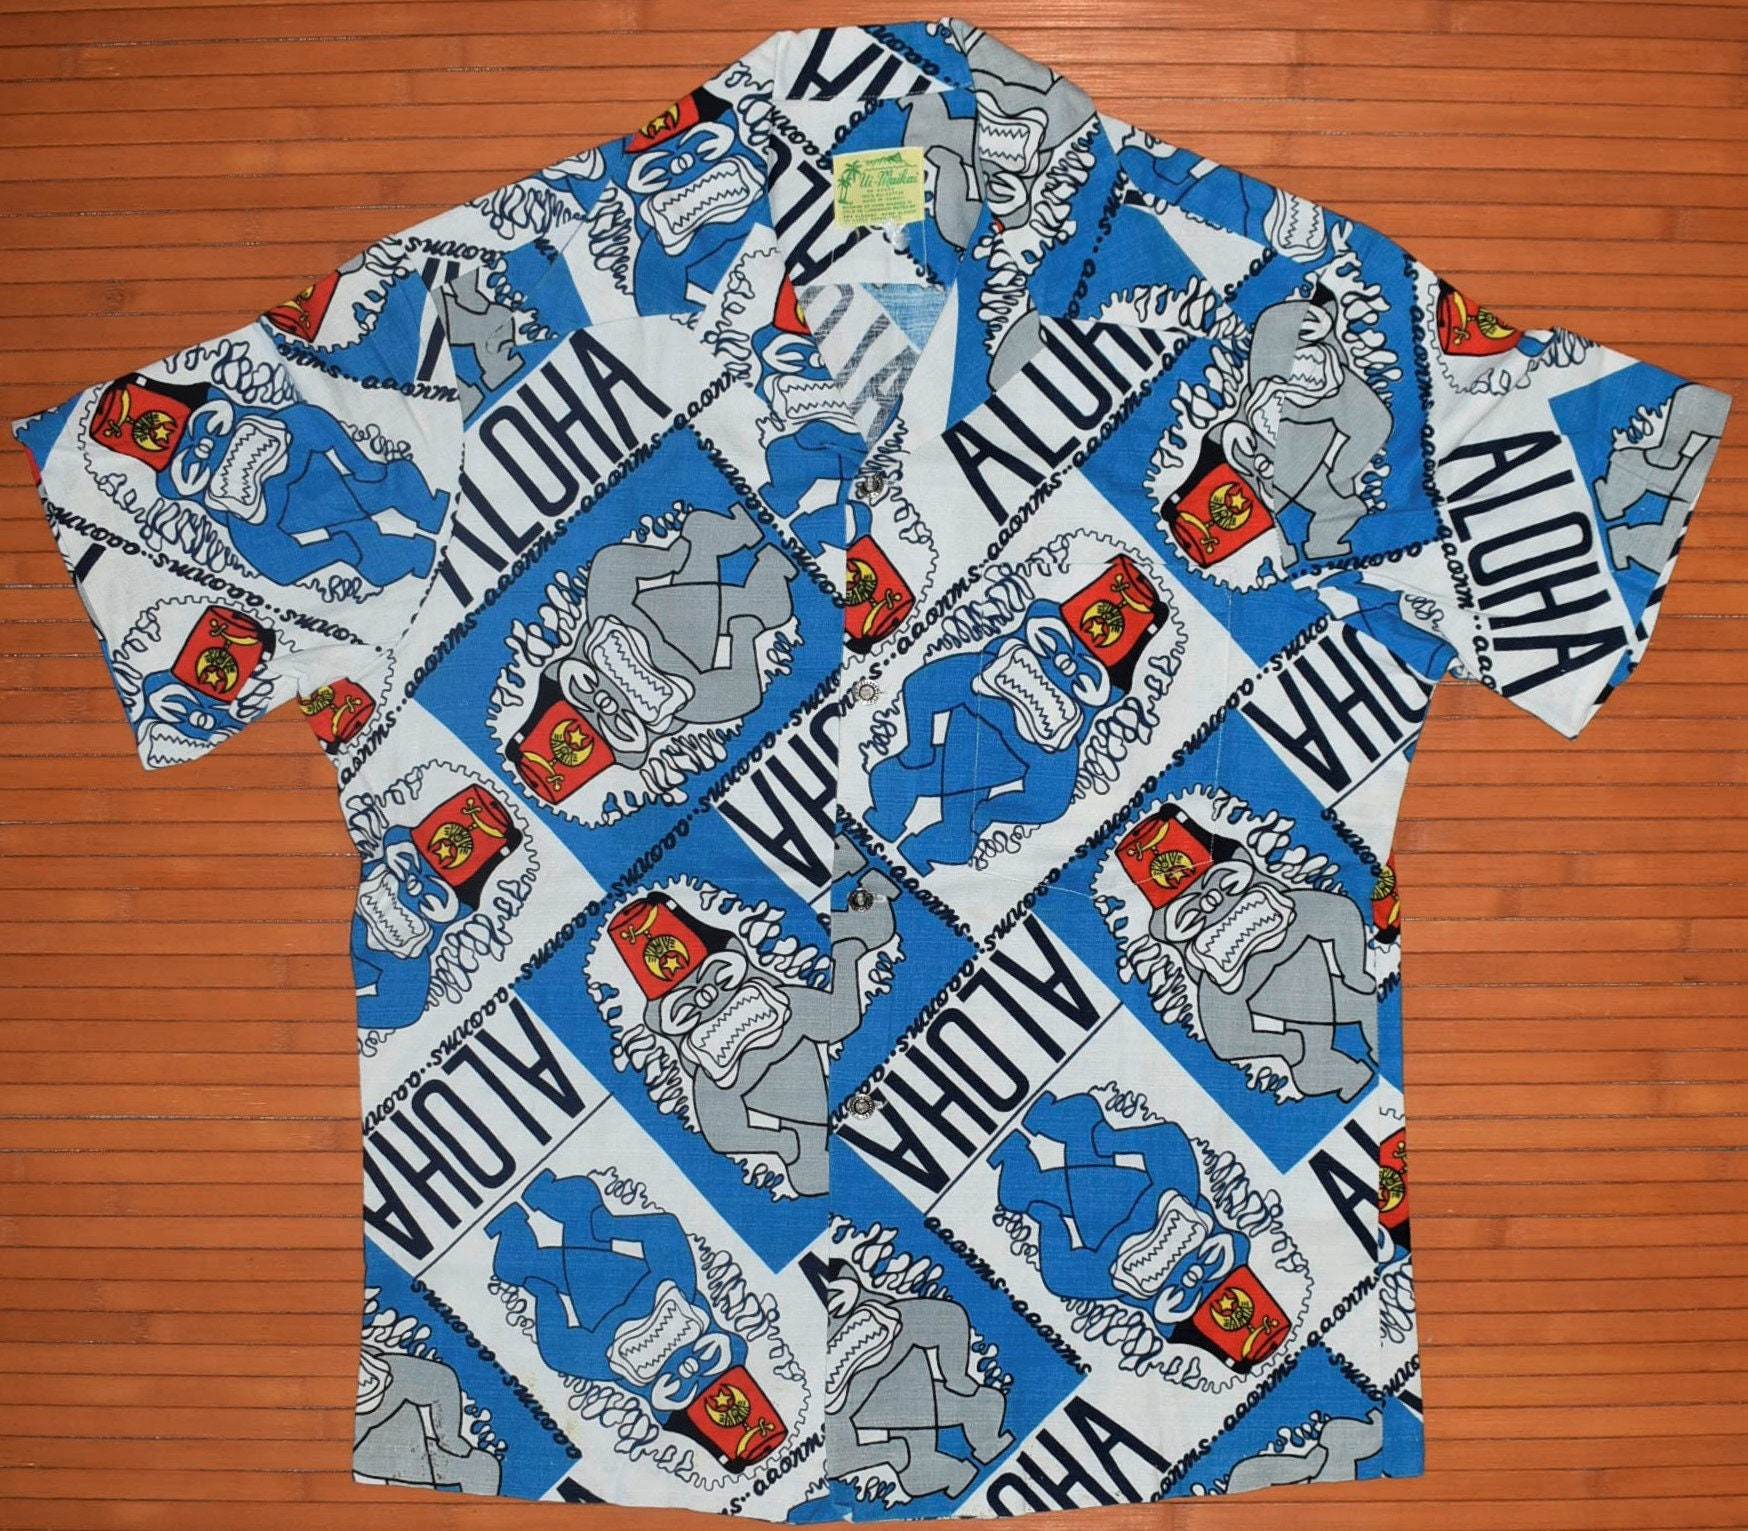 ce7560b1c25ac5 Men's 1960s Vintage Ui Maikai Blue Elvis Shriners Aloha Shirt - M ...